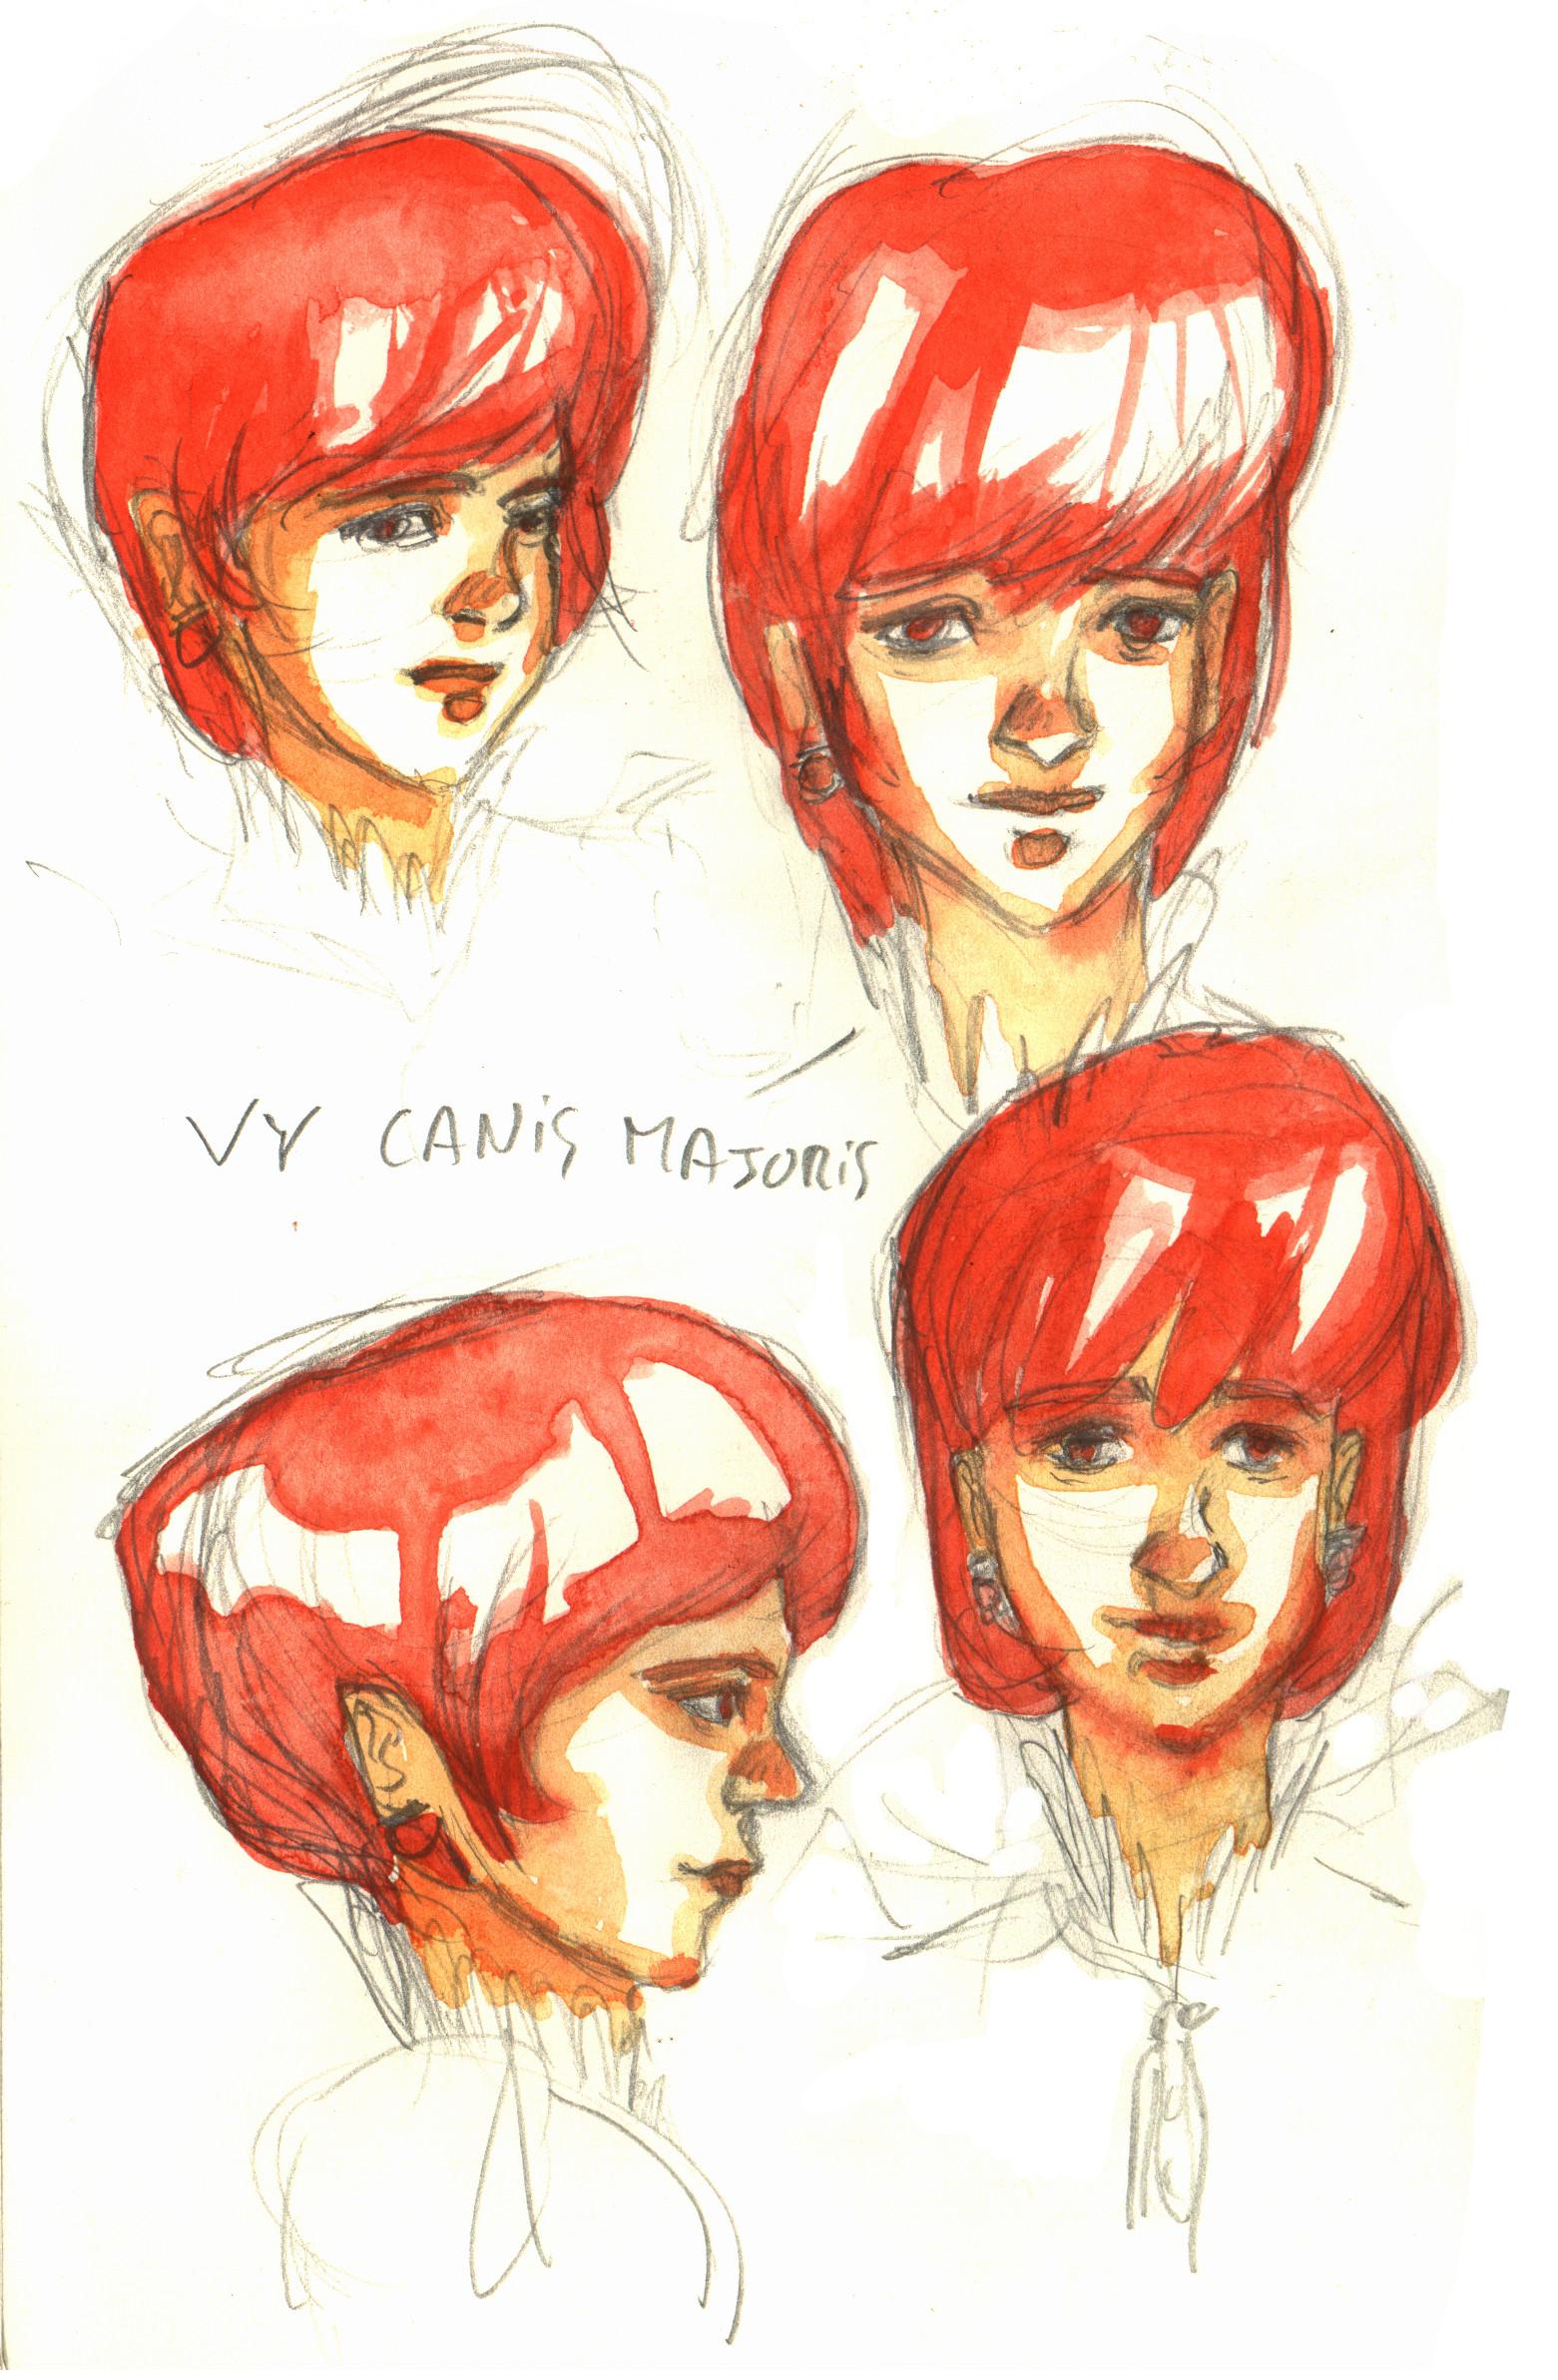 VY Canis Majoris | Chara Design 2